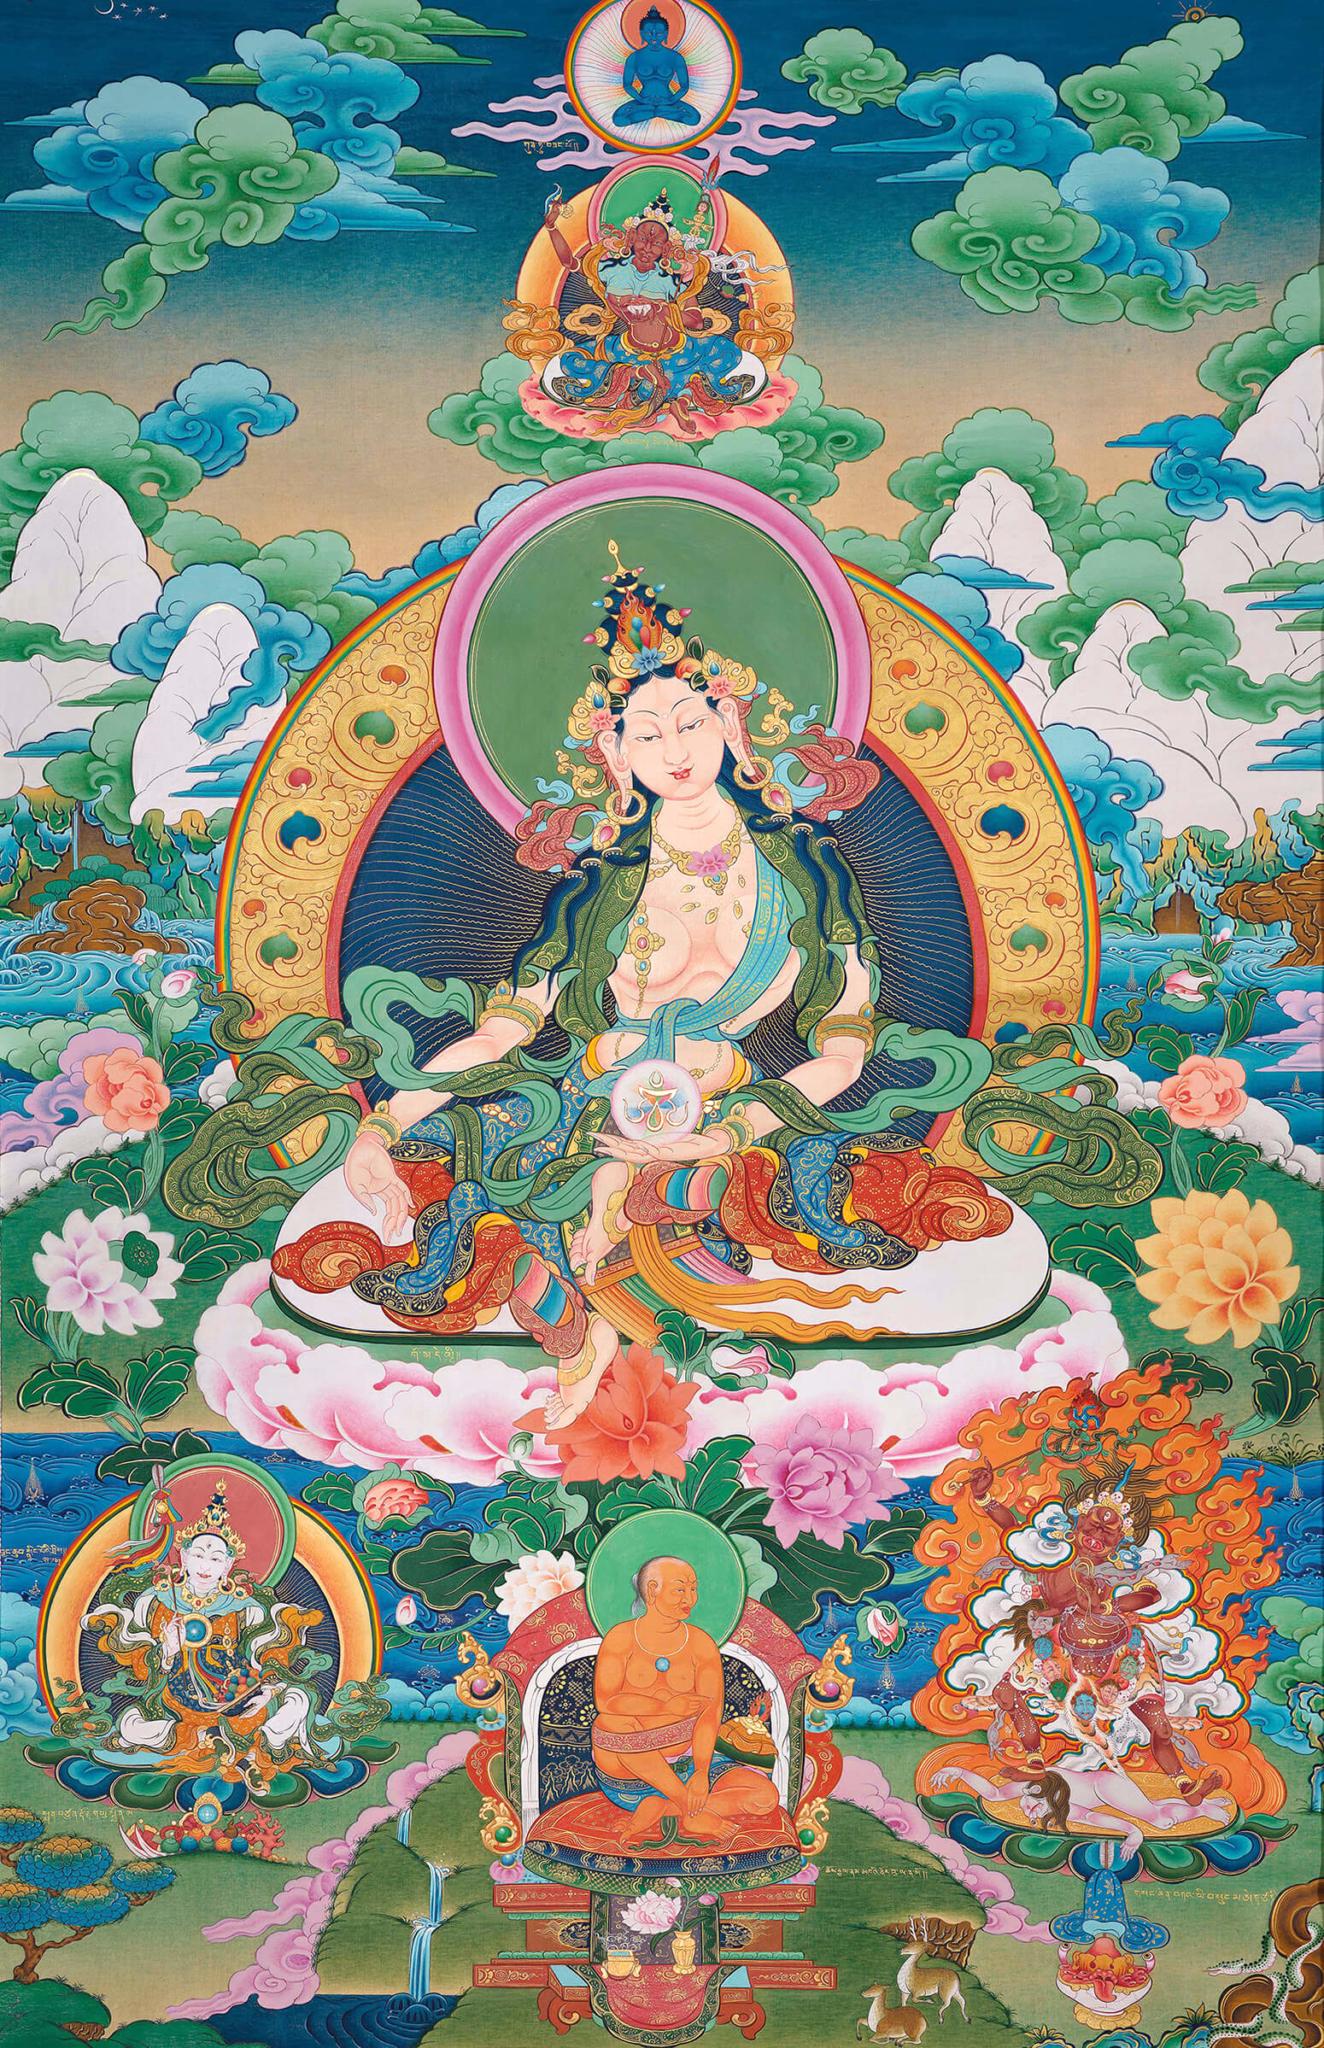 Transmission of the Longsal teachings